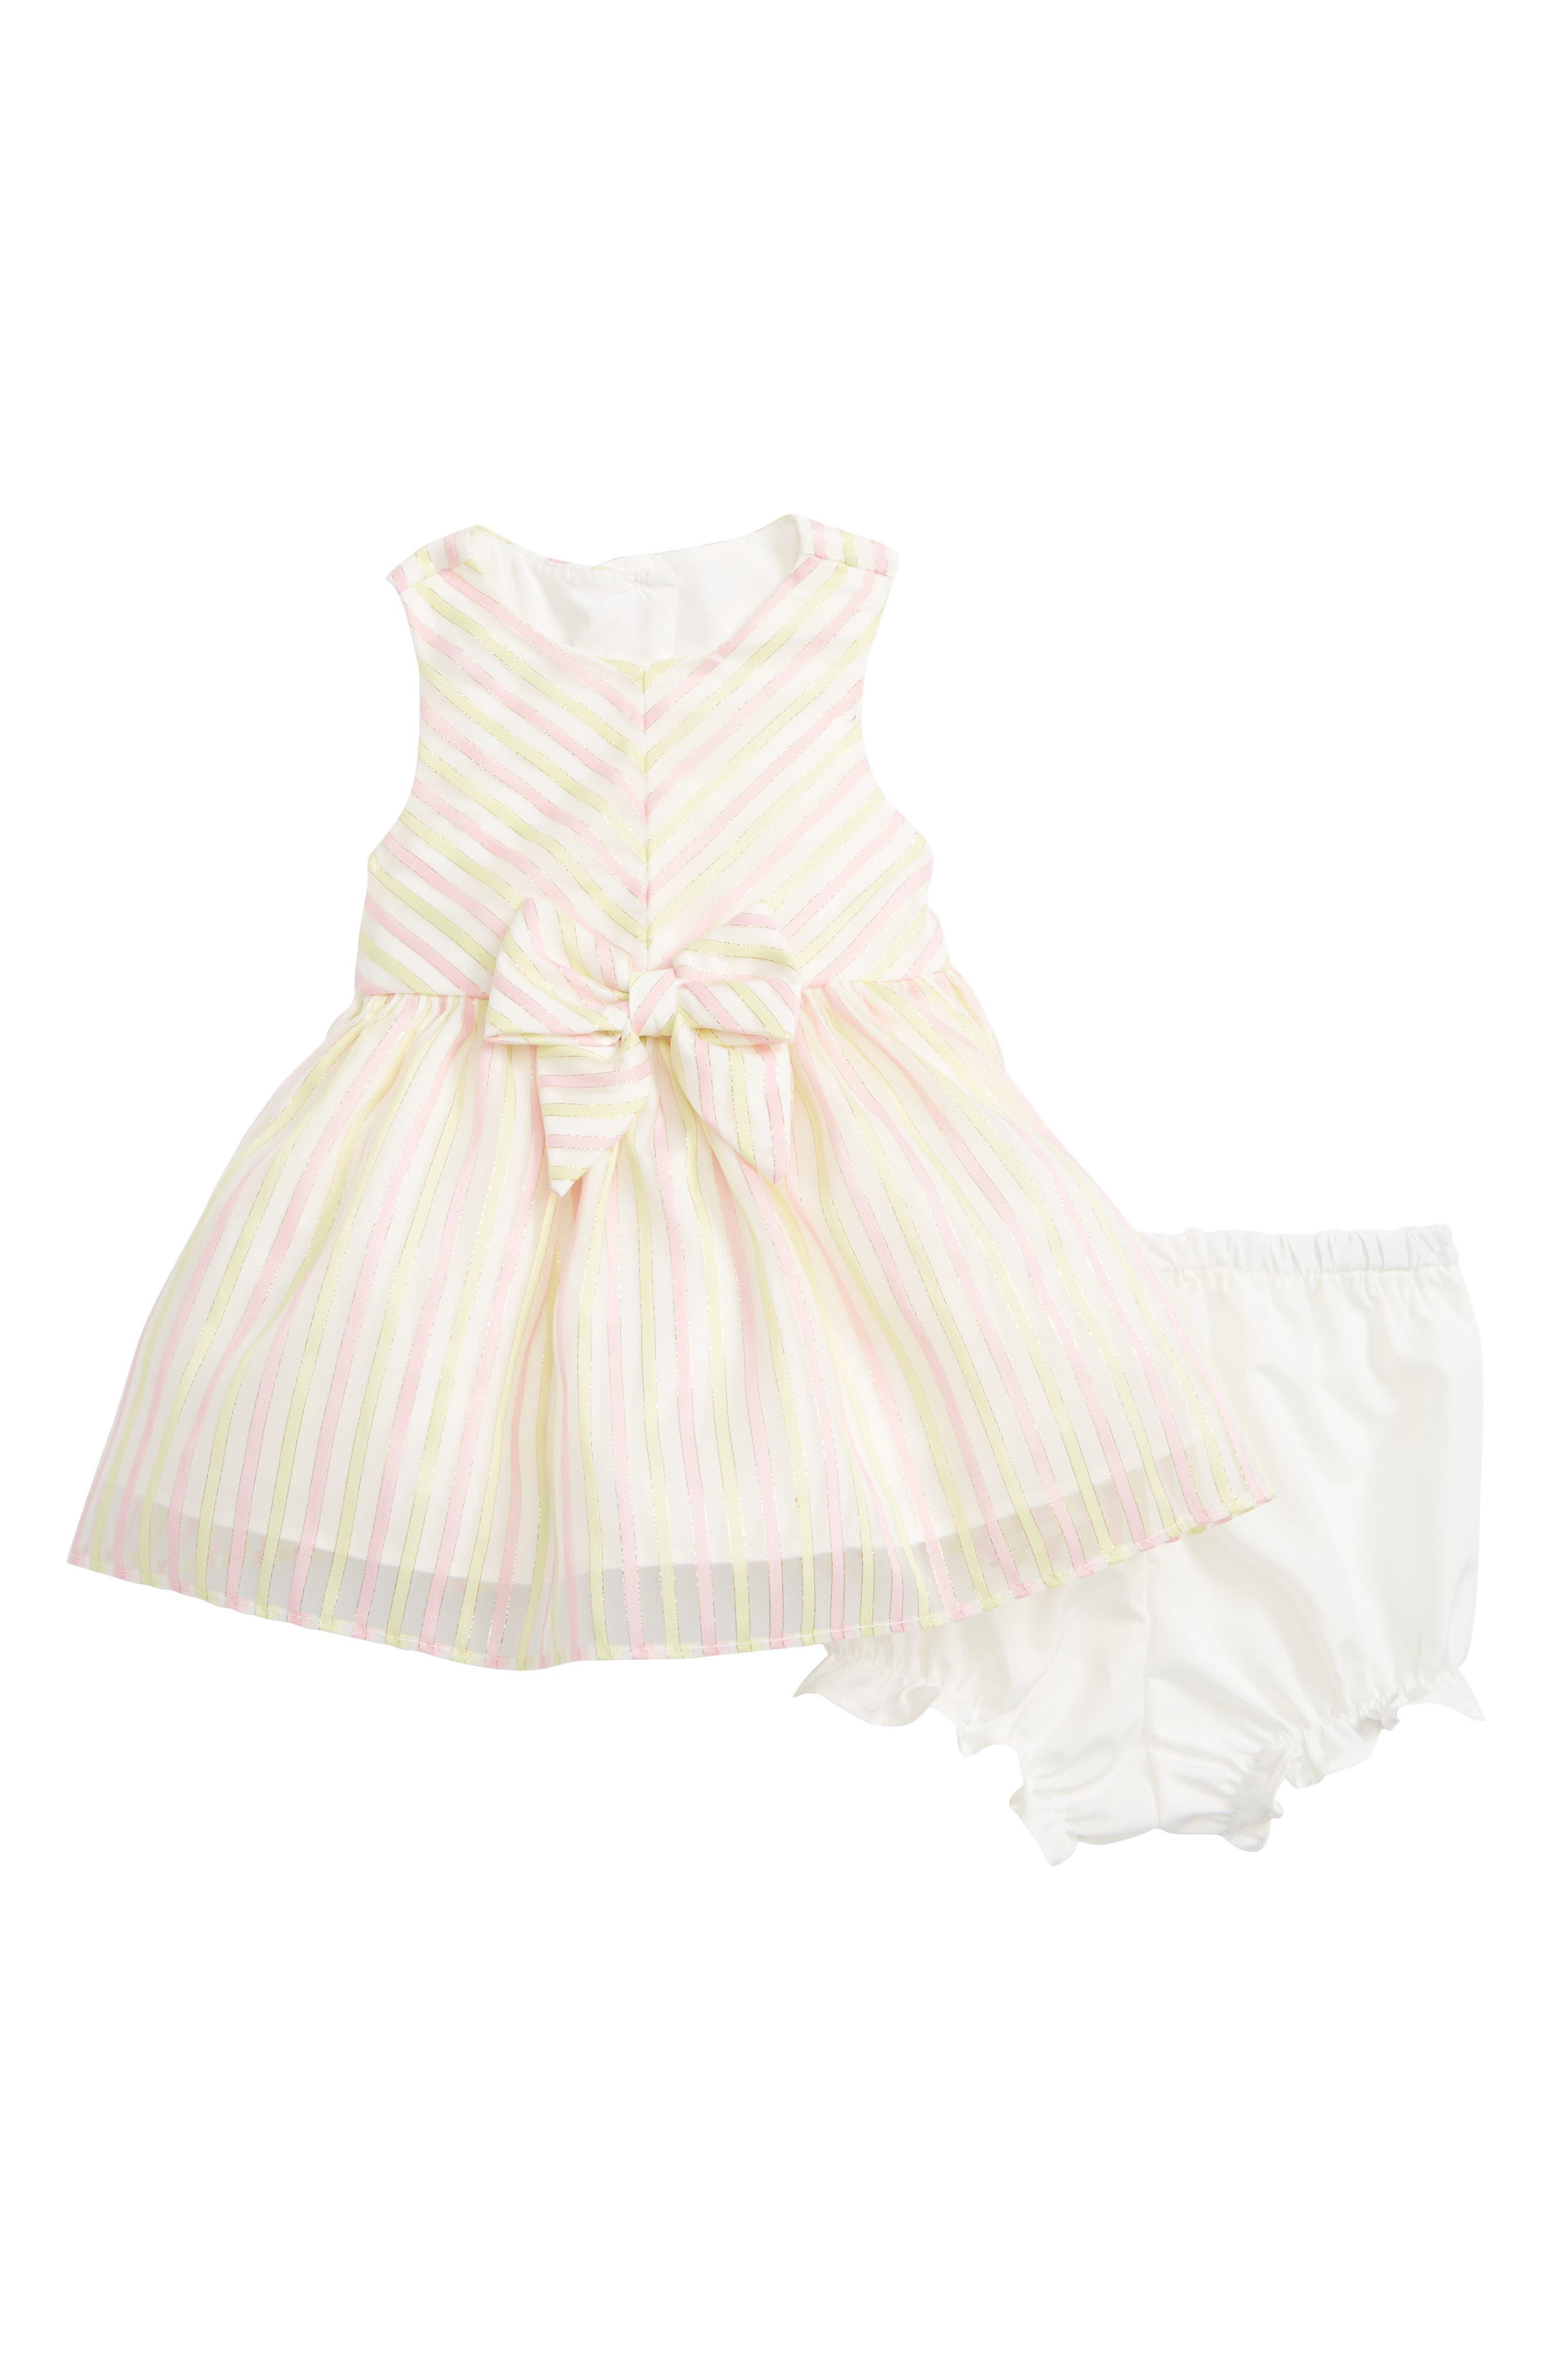 Stripe Dress,                             Main thumbnail 1, color,                             Pink/ Yellow